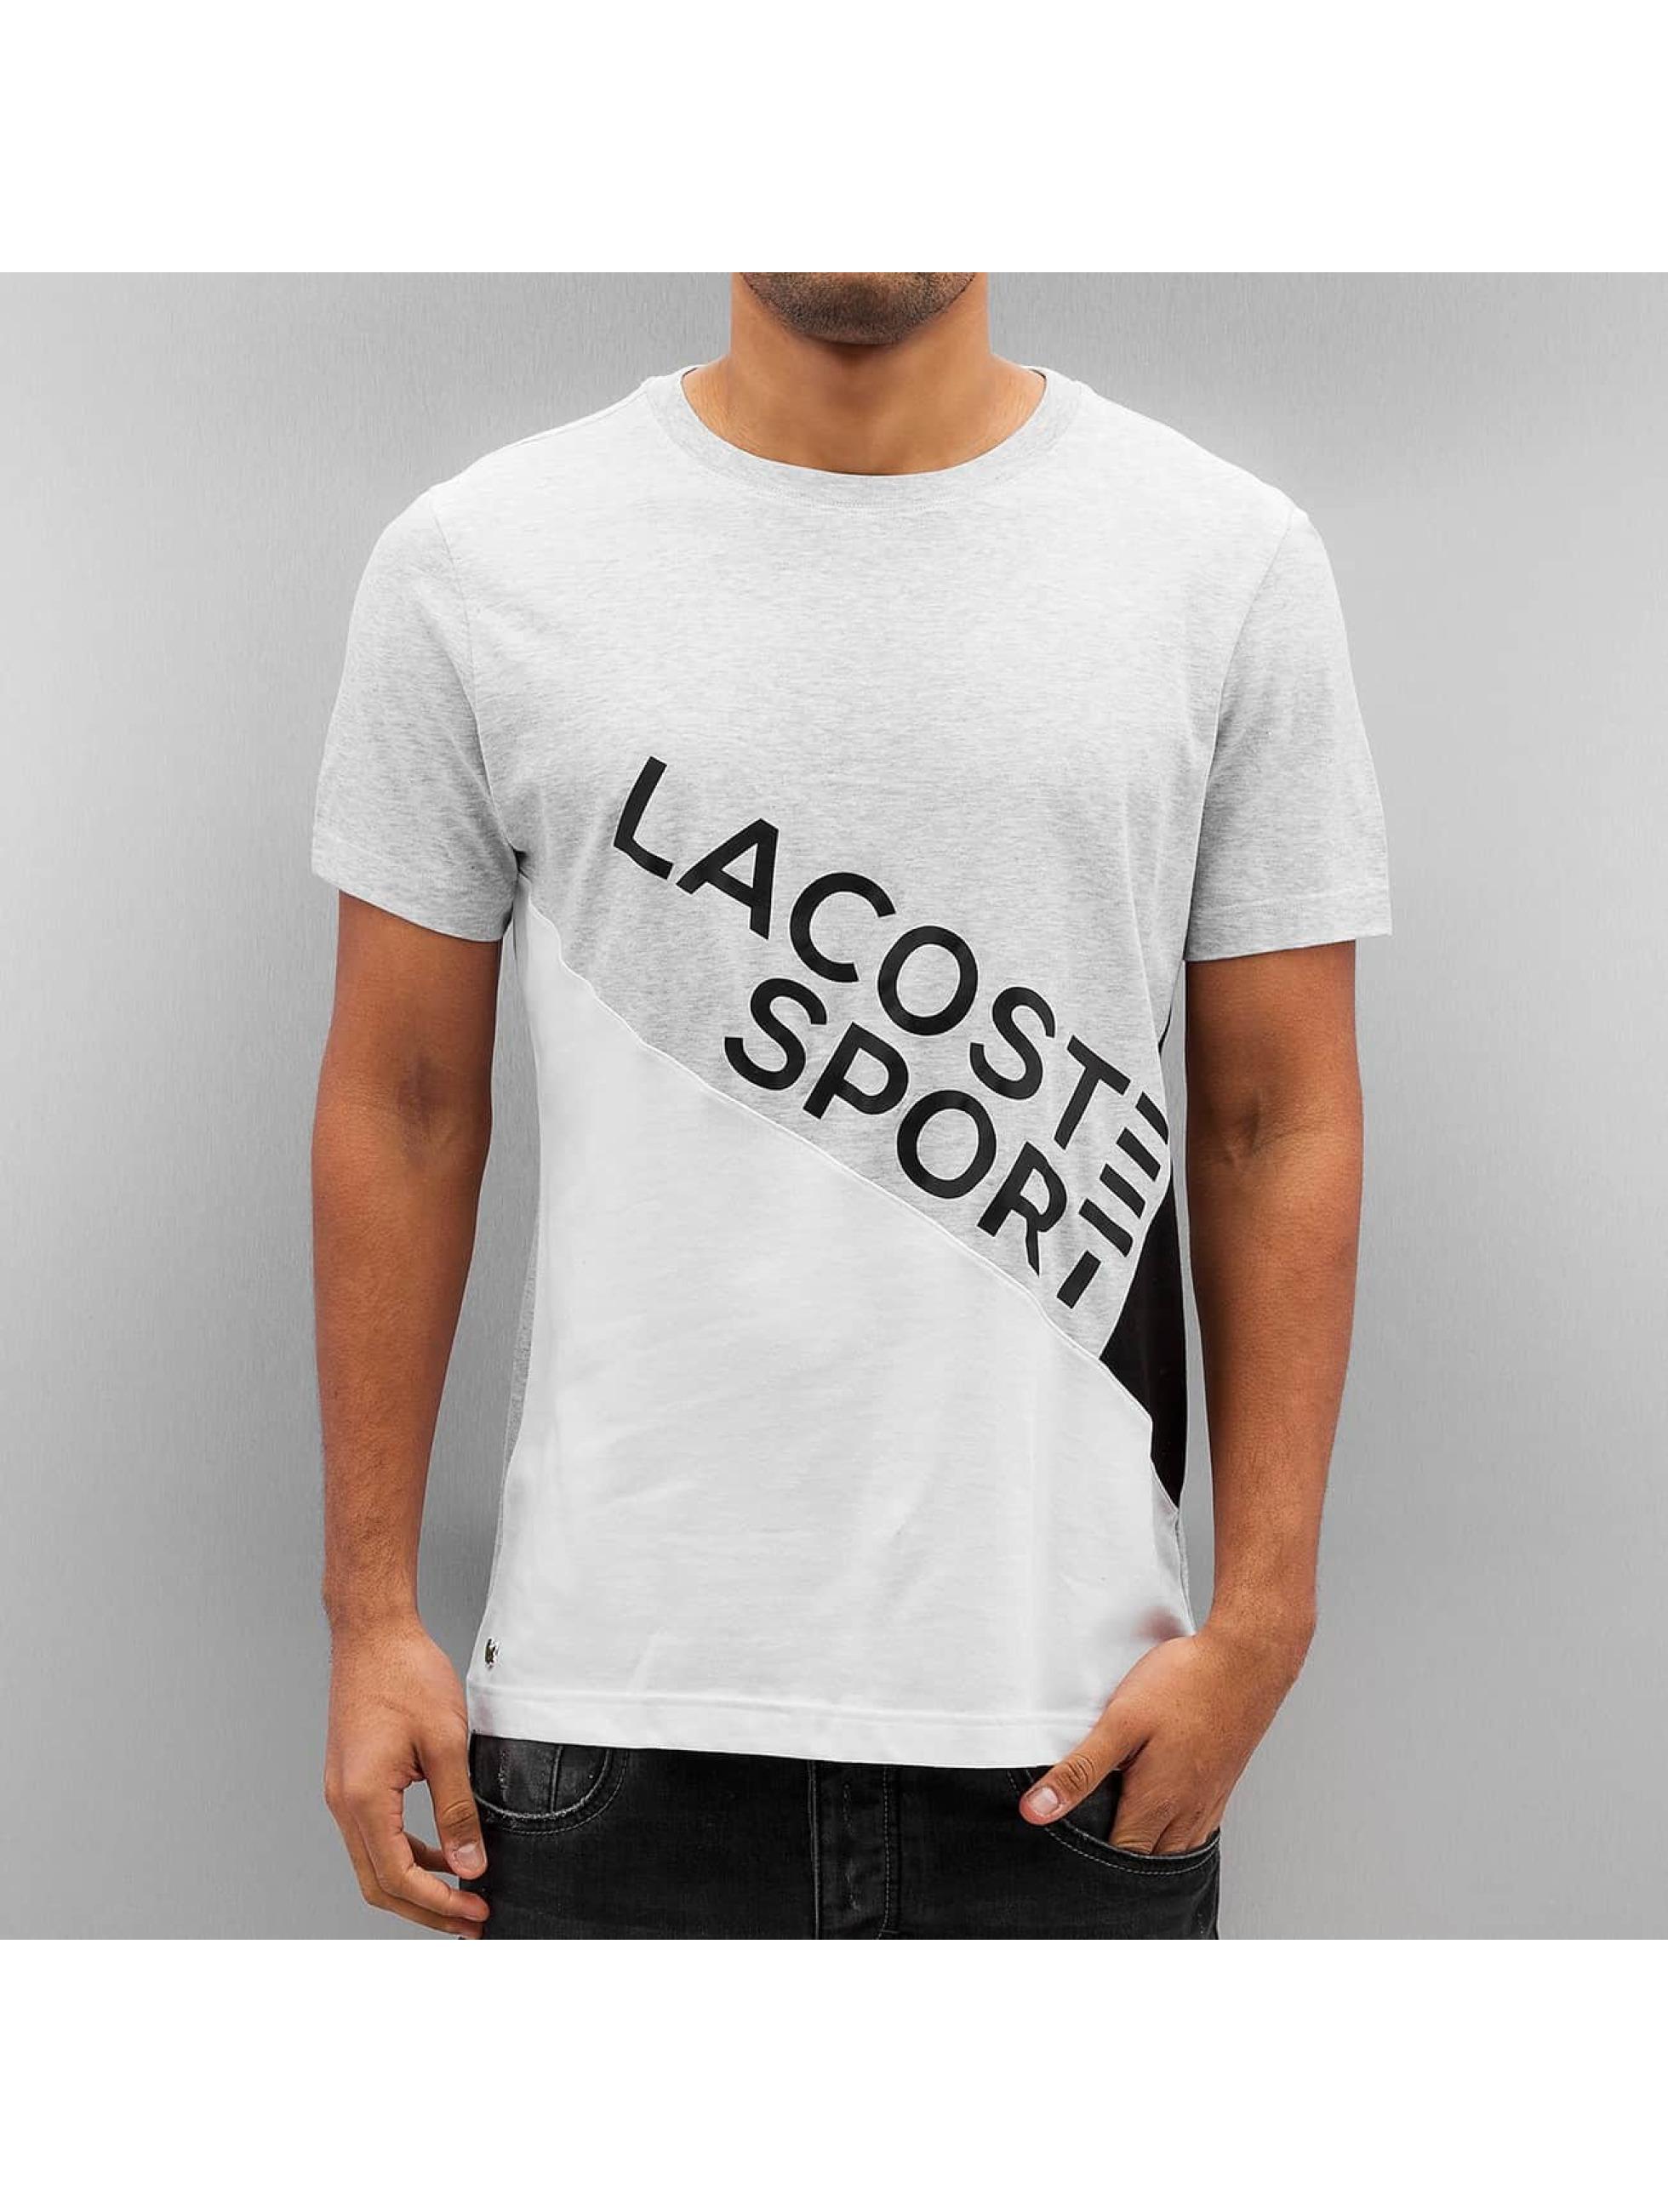 Lacoste Classic T Shirt Silver Chine White Black Black